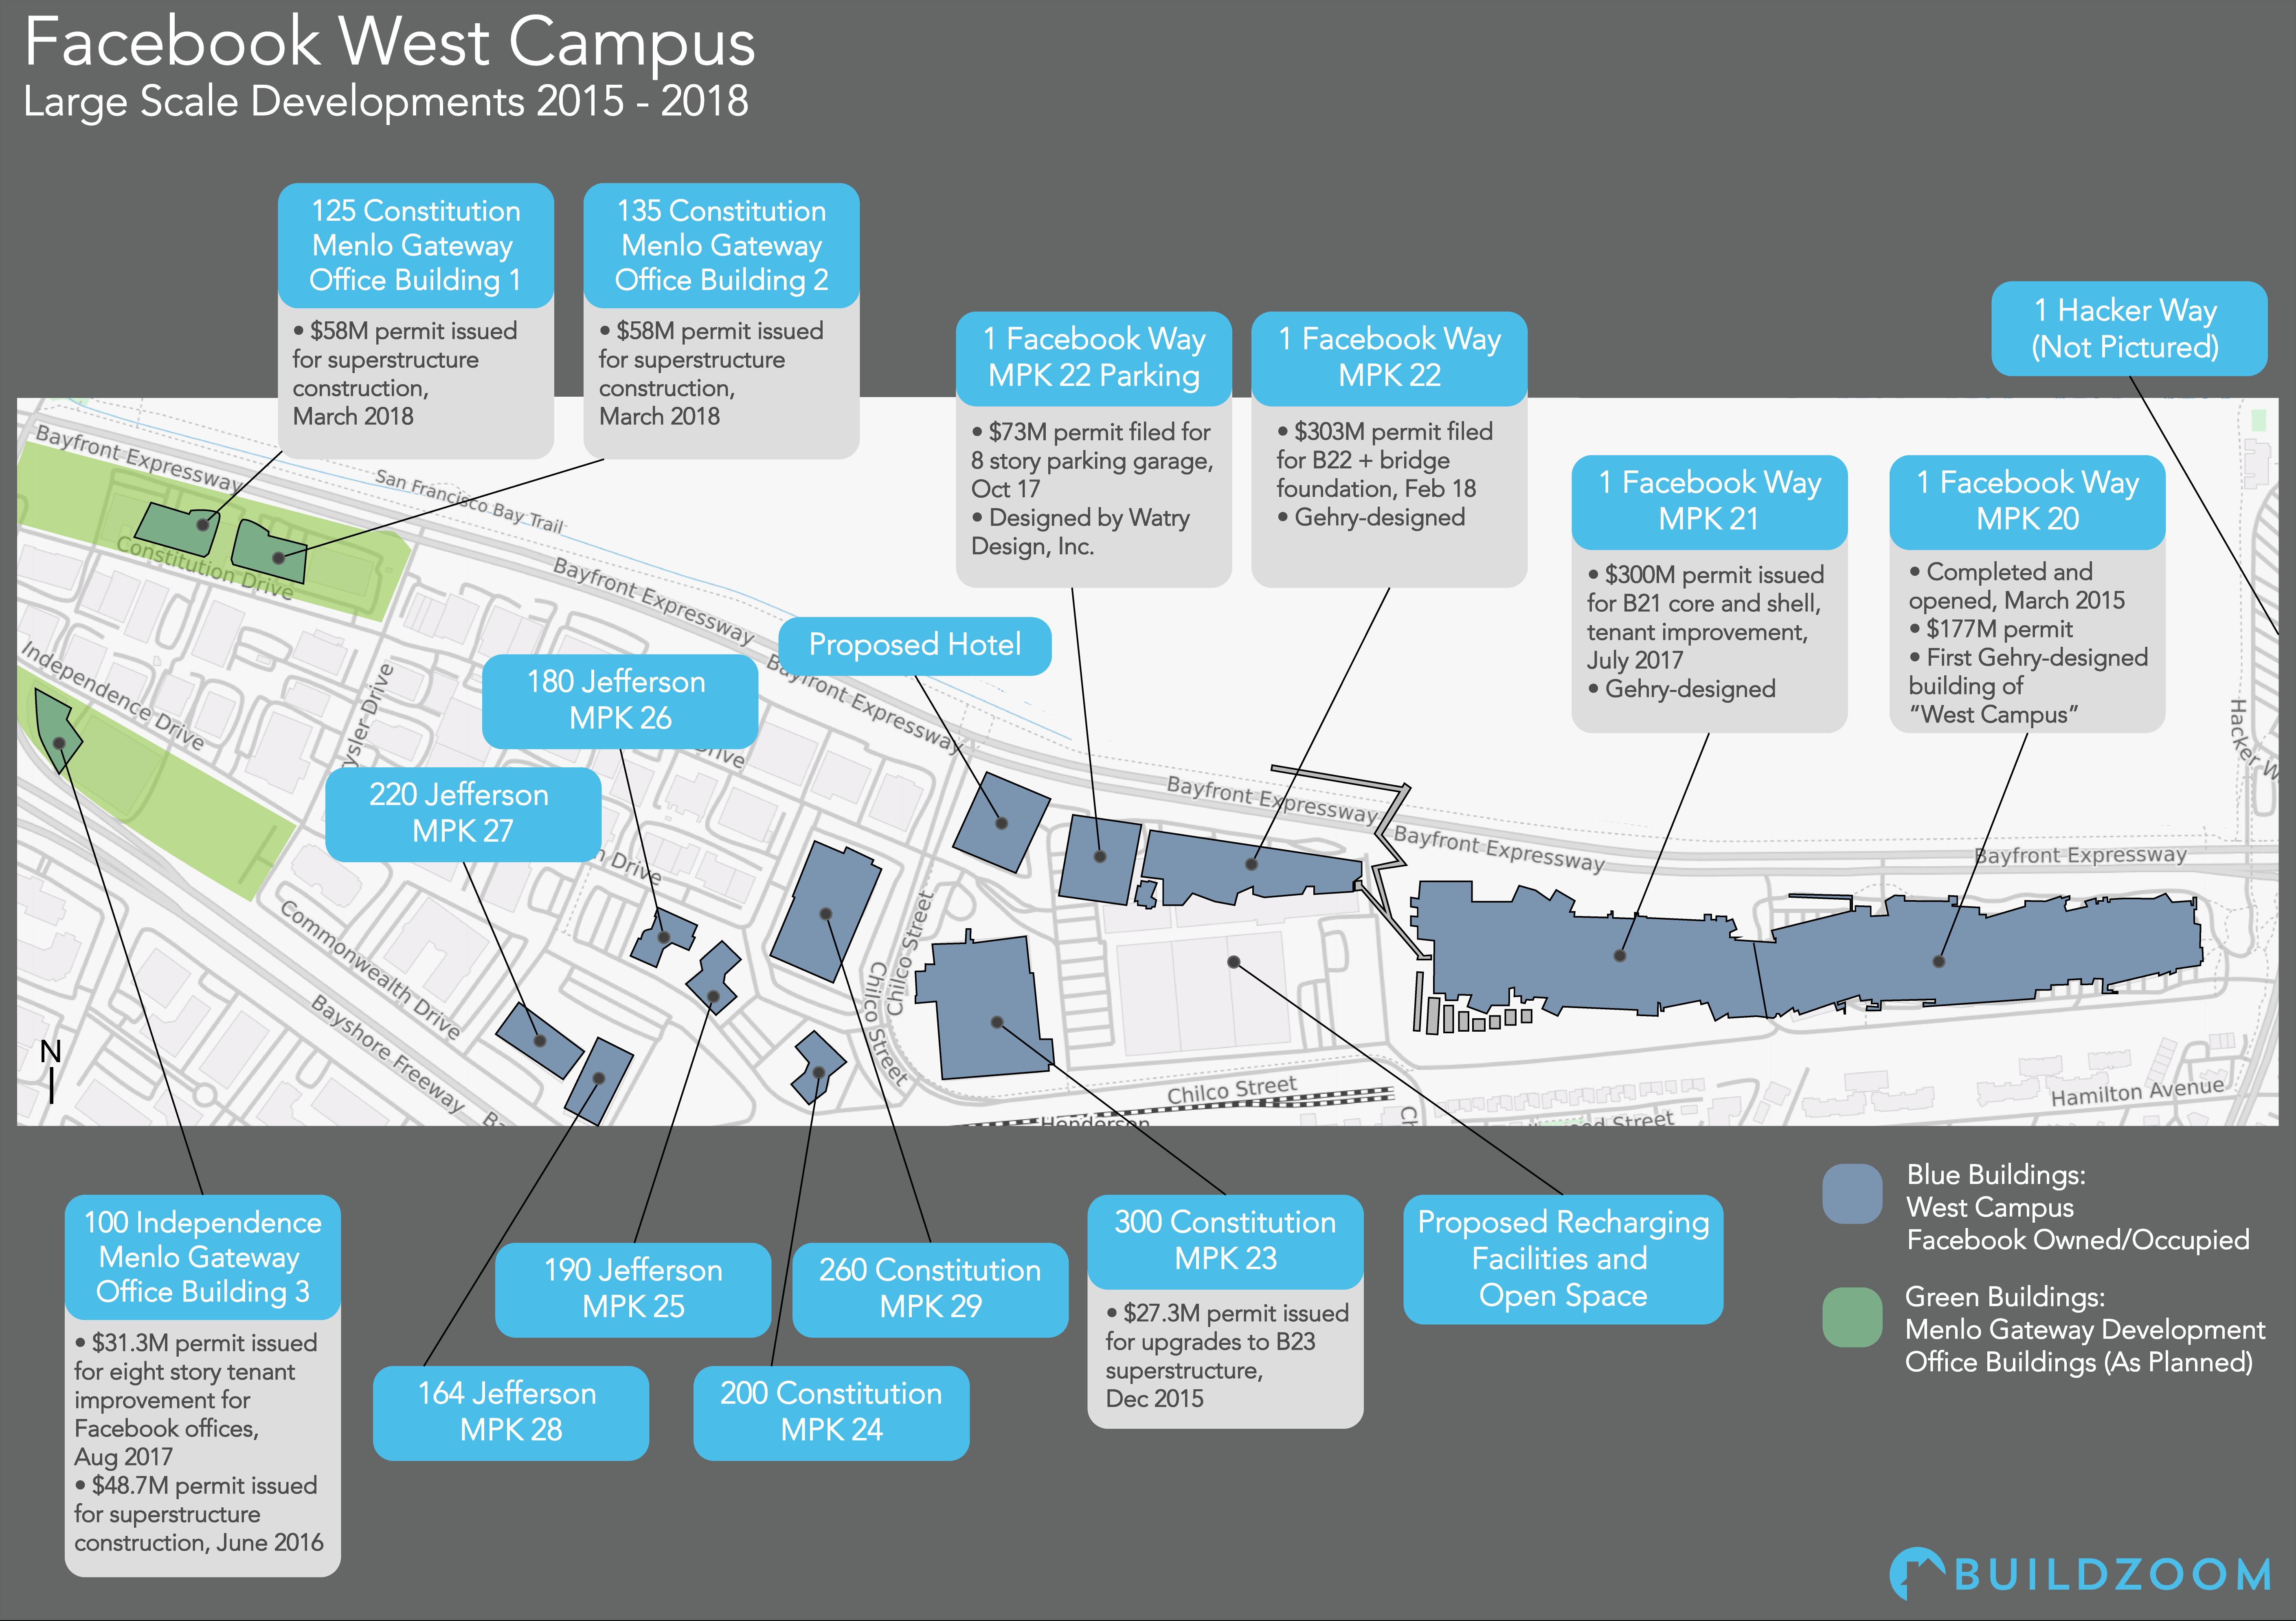 Facebook's West Campus construction costs exceed $1 billion